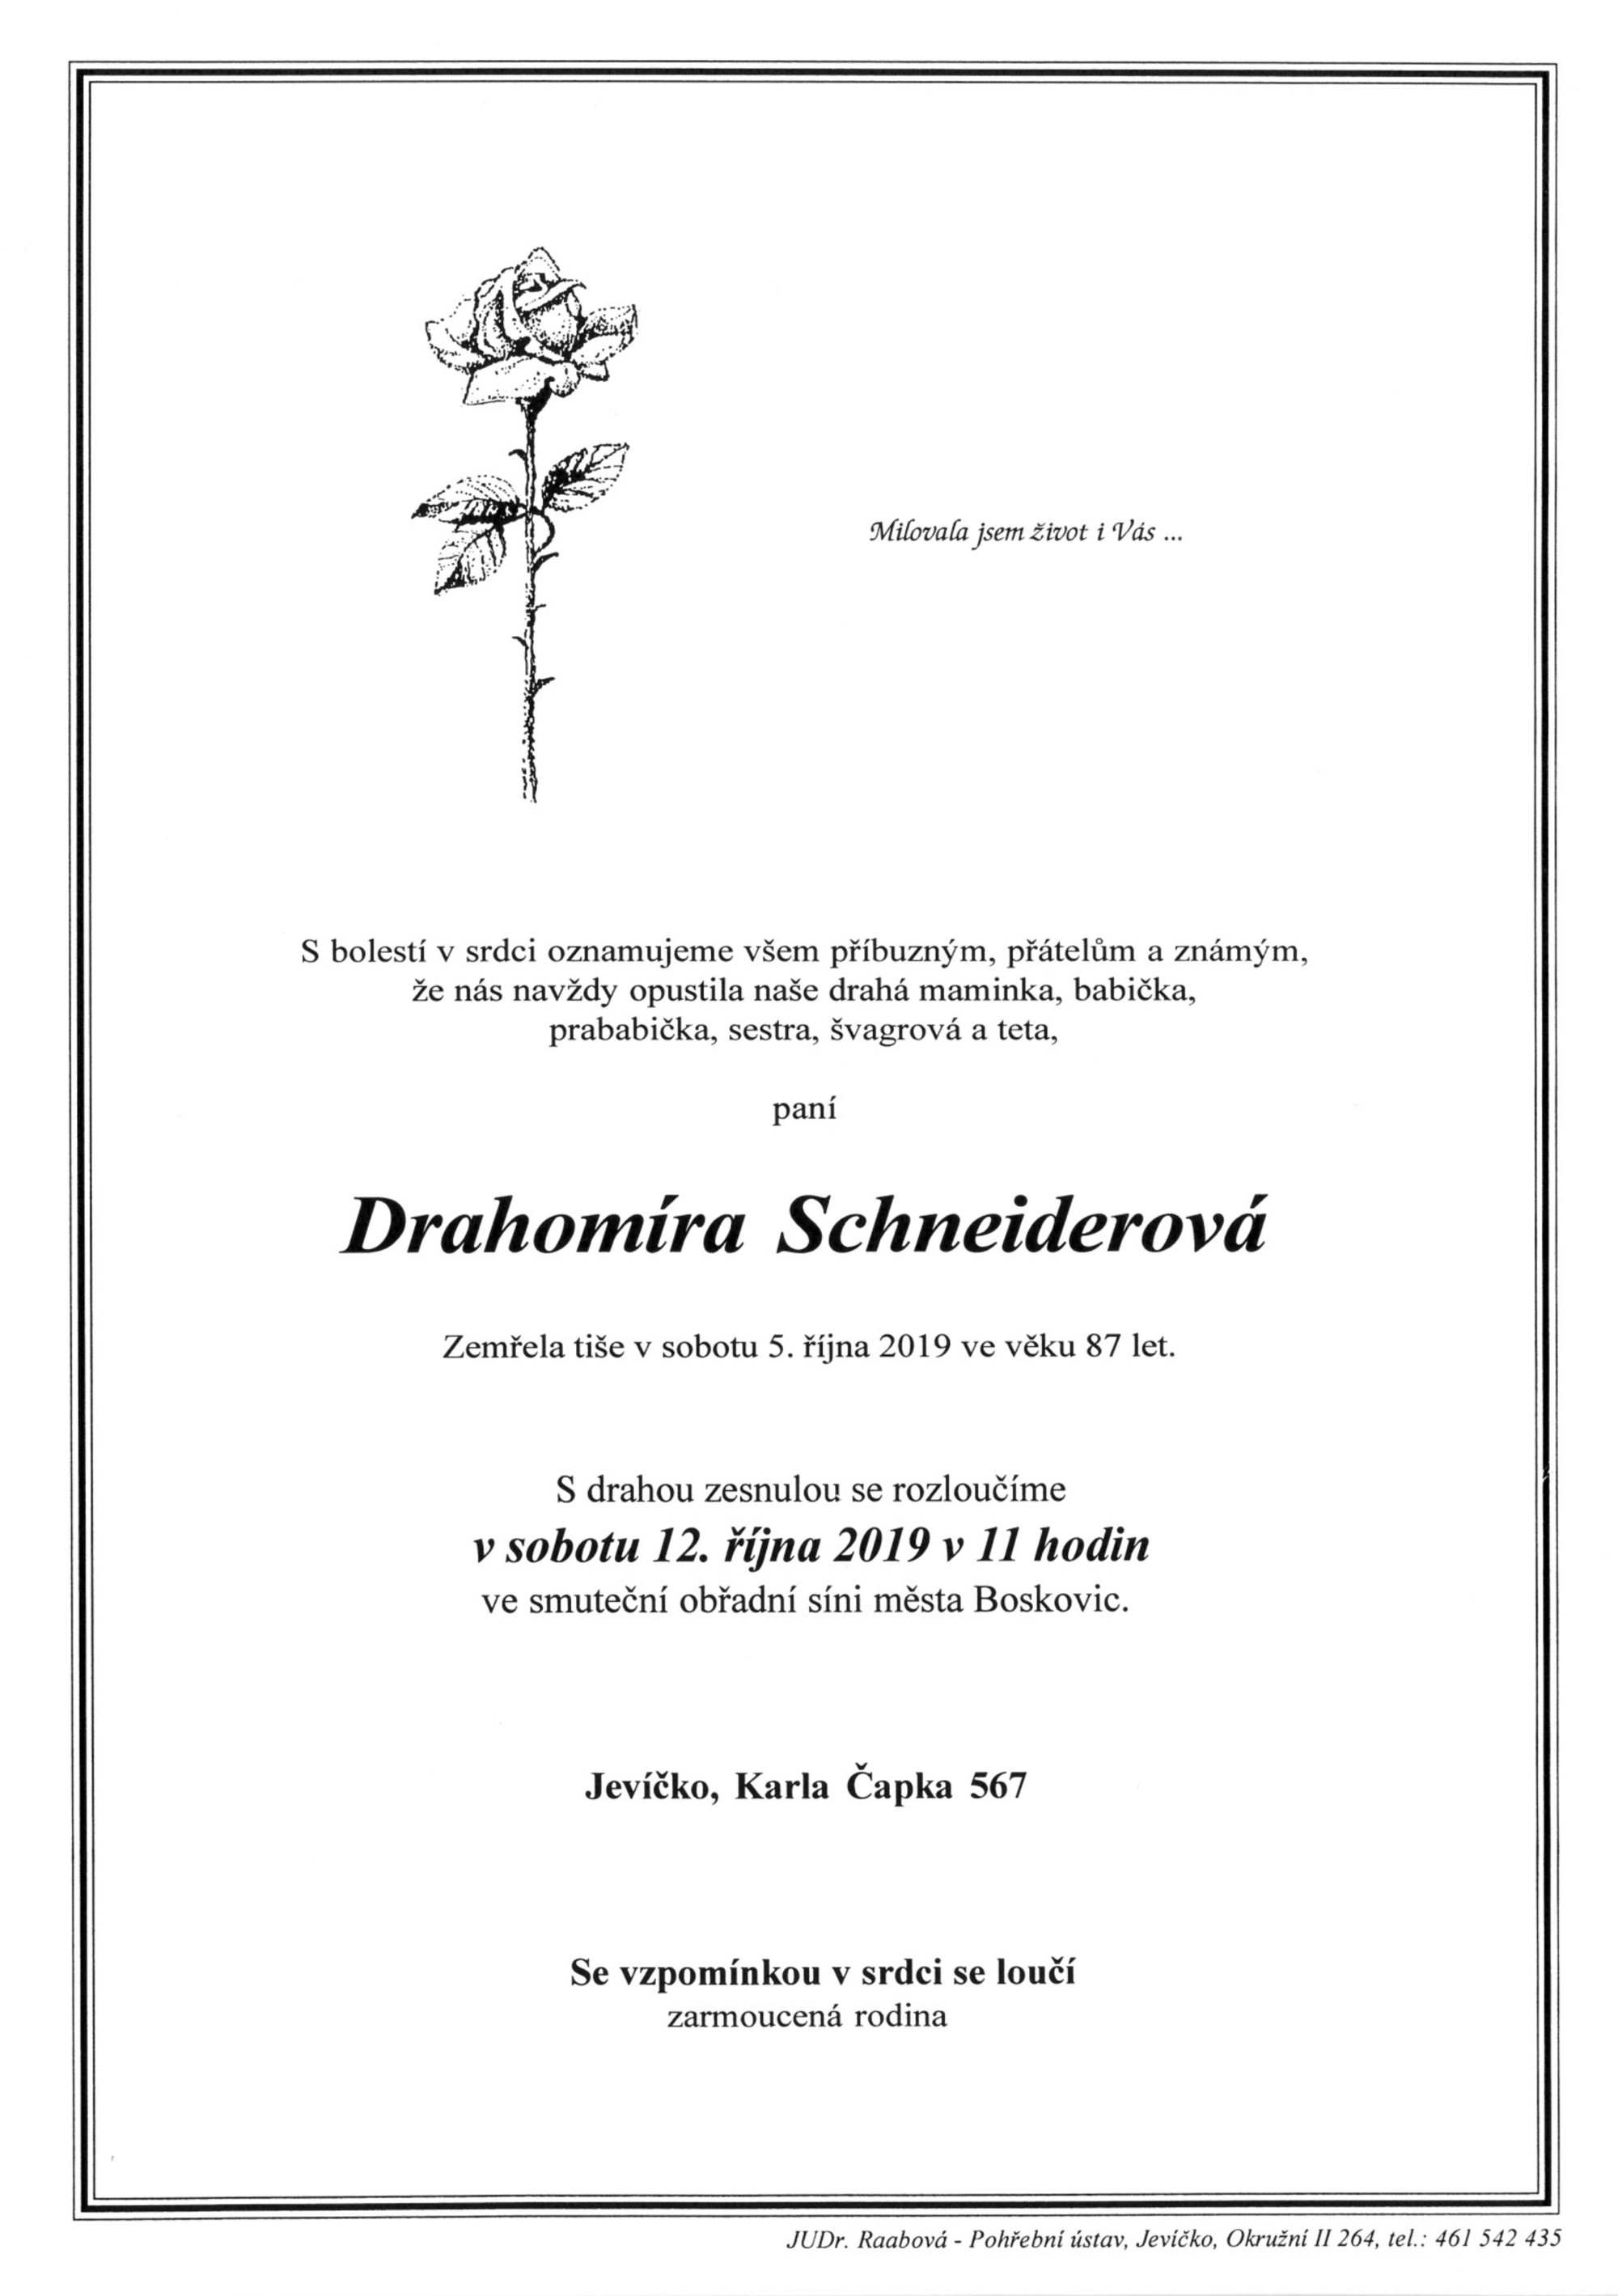 Drahomíra Schneiderová